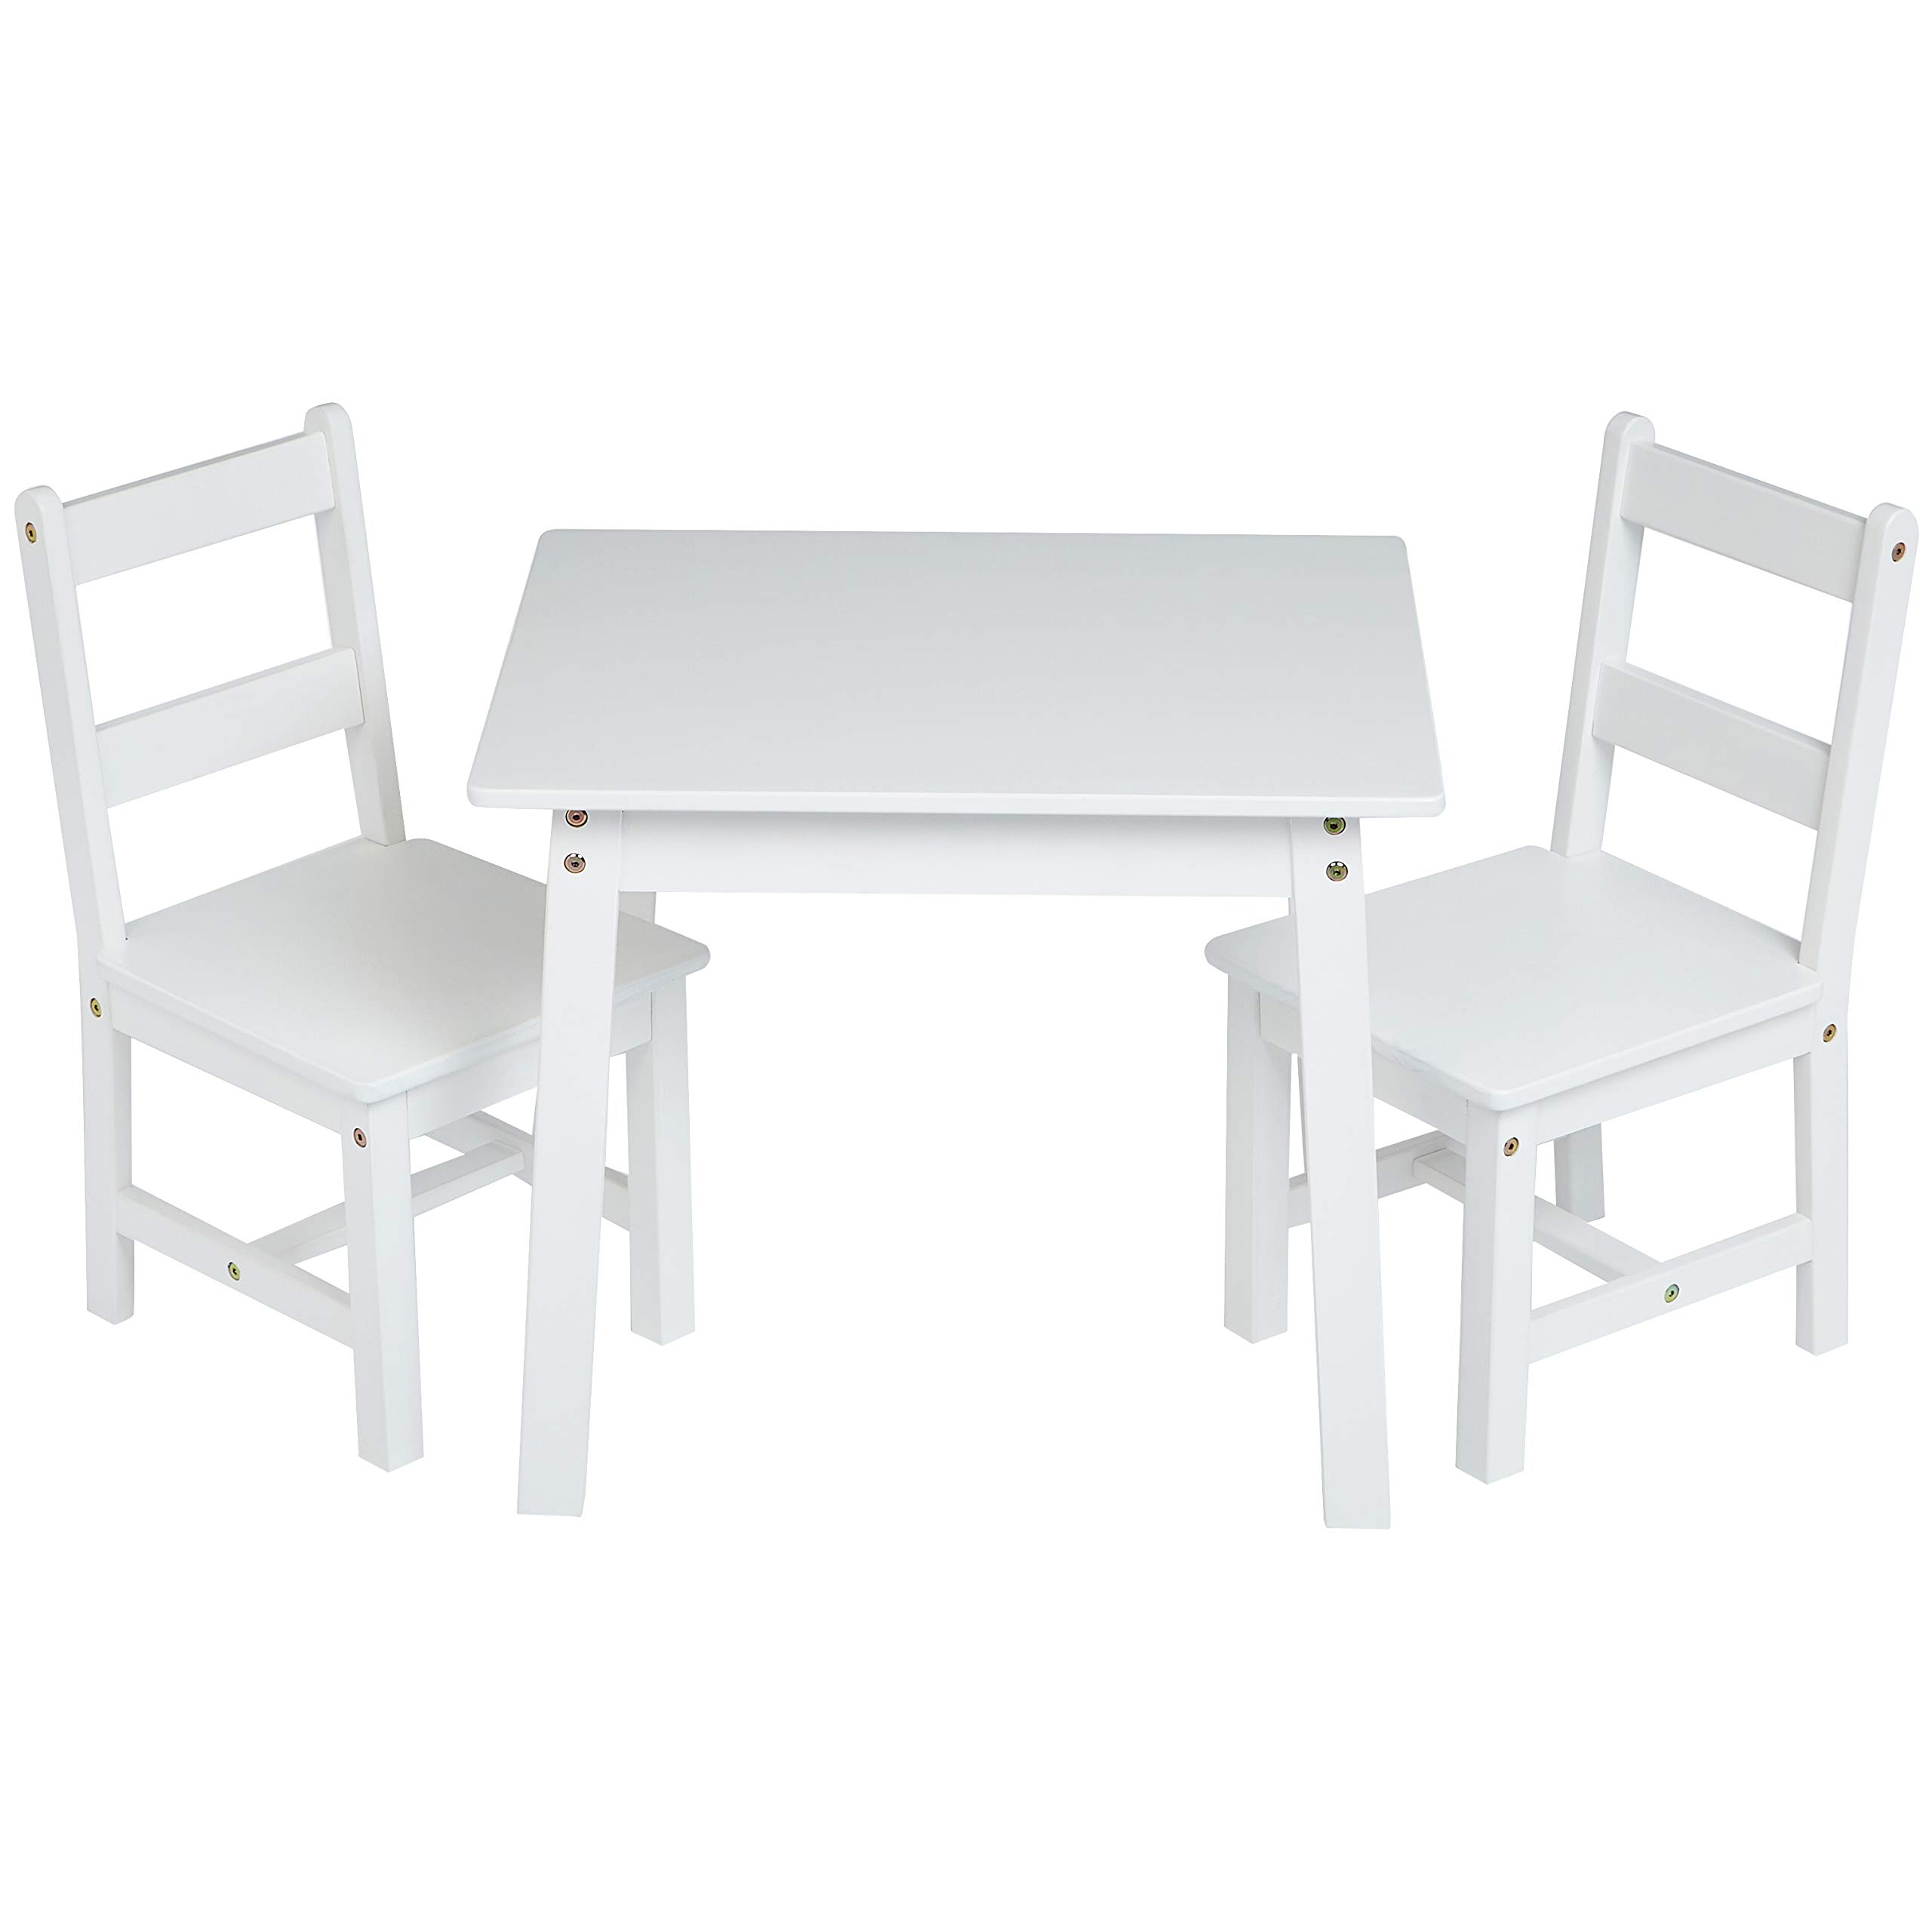 AmazonBasics Kids Solid Wood Table and 2 Chair Set, White by AmazonBasics (Image #1)